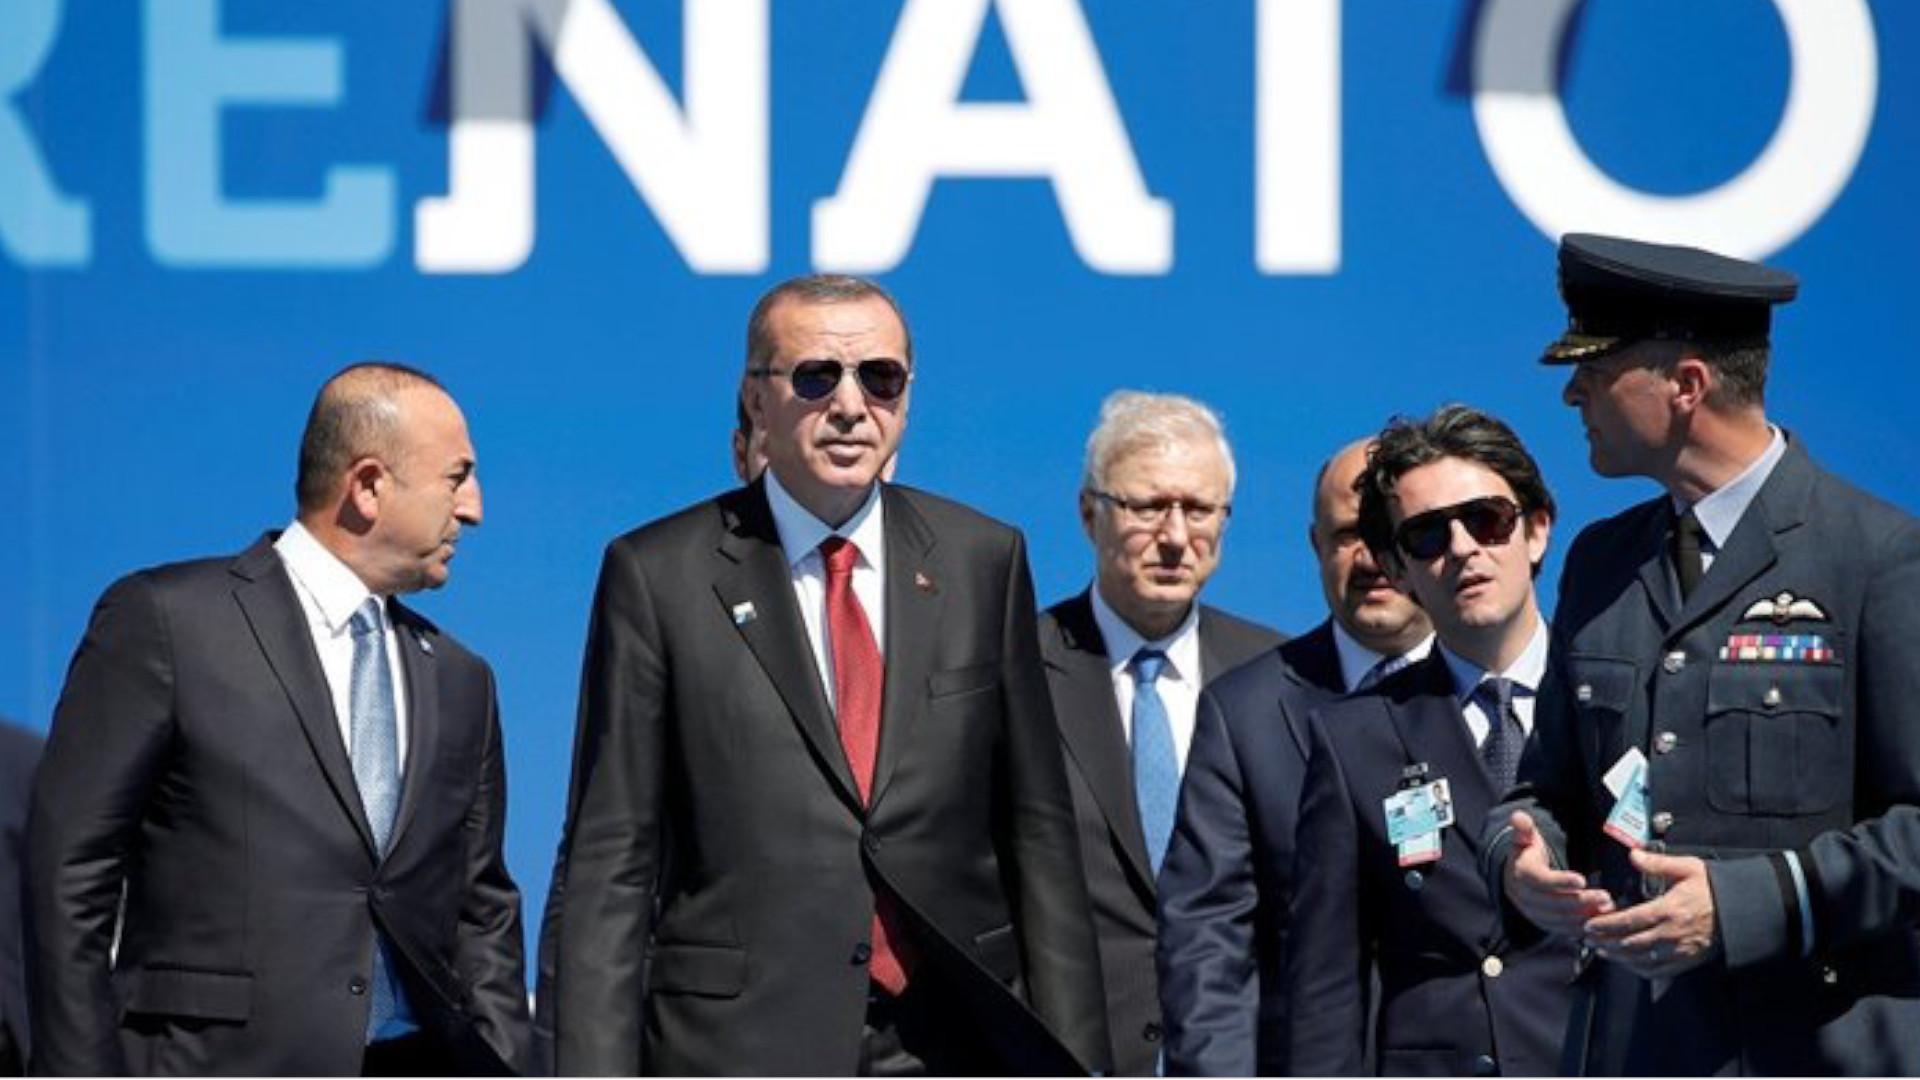 Much-awaited Erdoğan-Biden encounter and the weight of domestic scandals